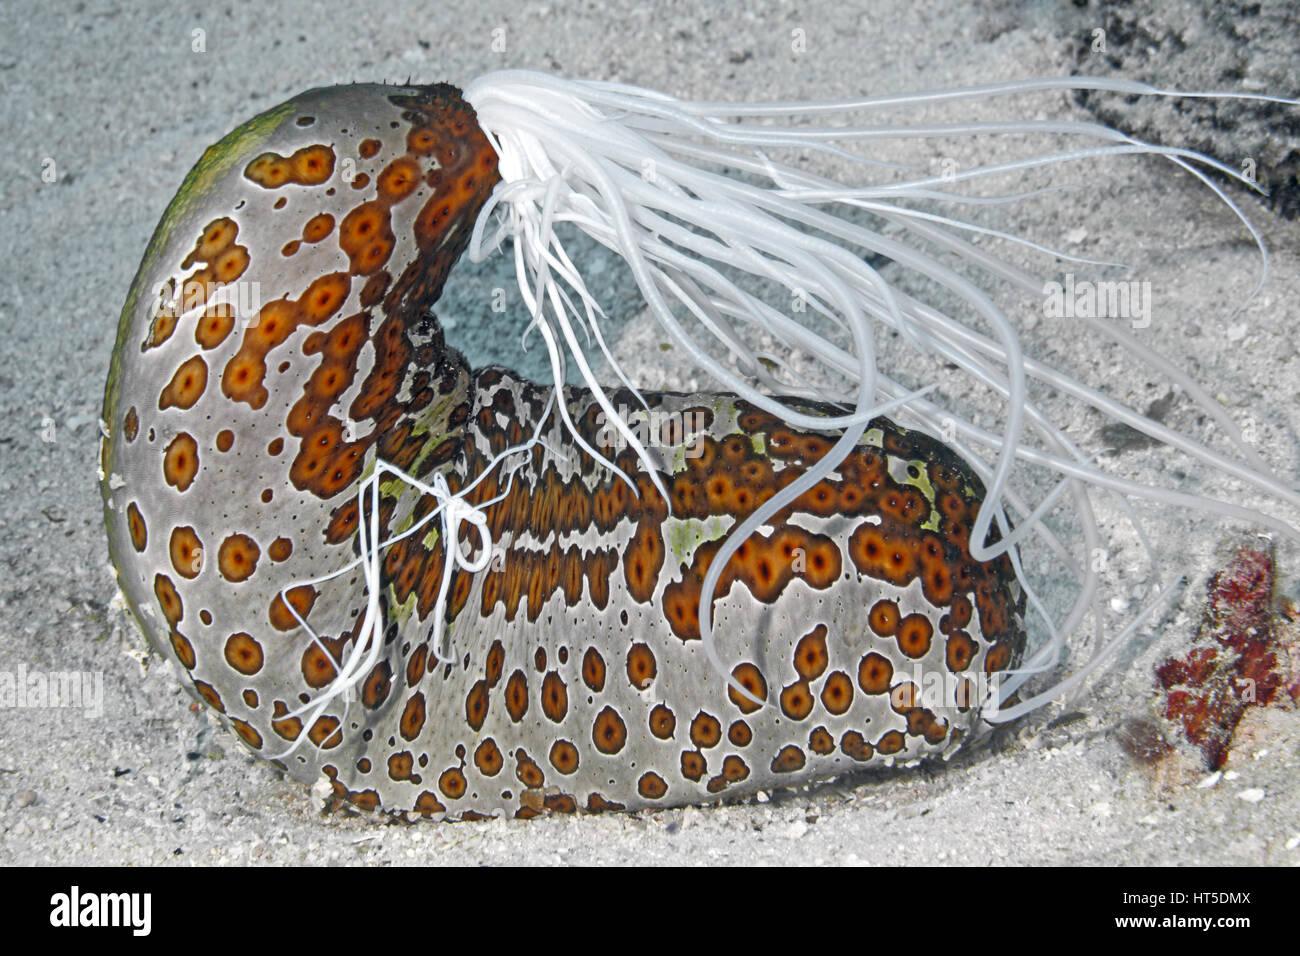 leopard-sea-cucumber-bohadschia-argus-extruding-sticky-white-cuvierian-HT5DMX.jpg